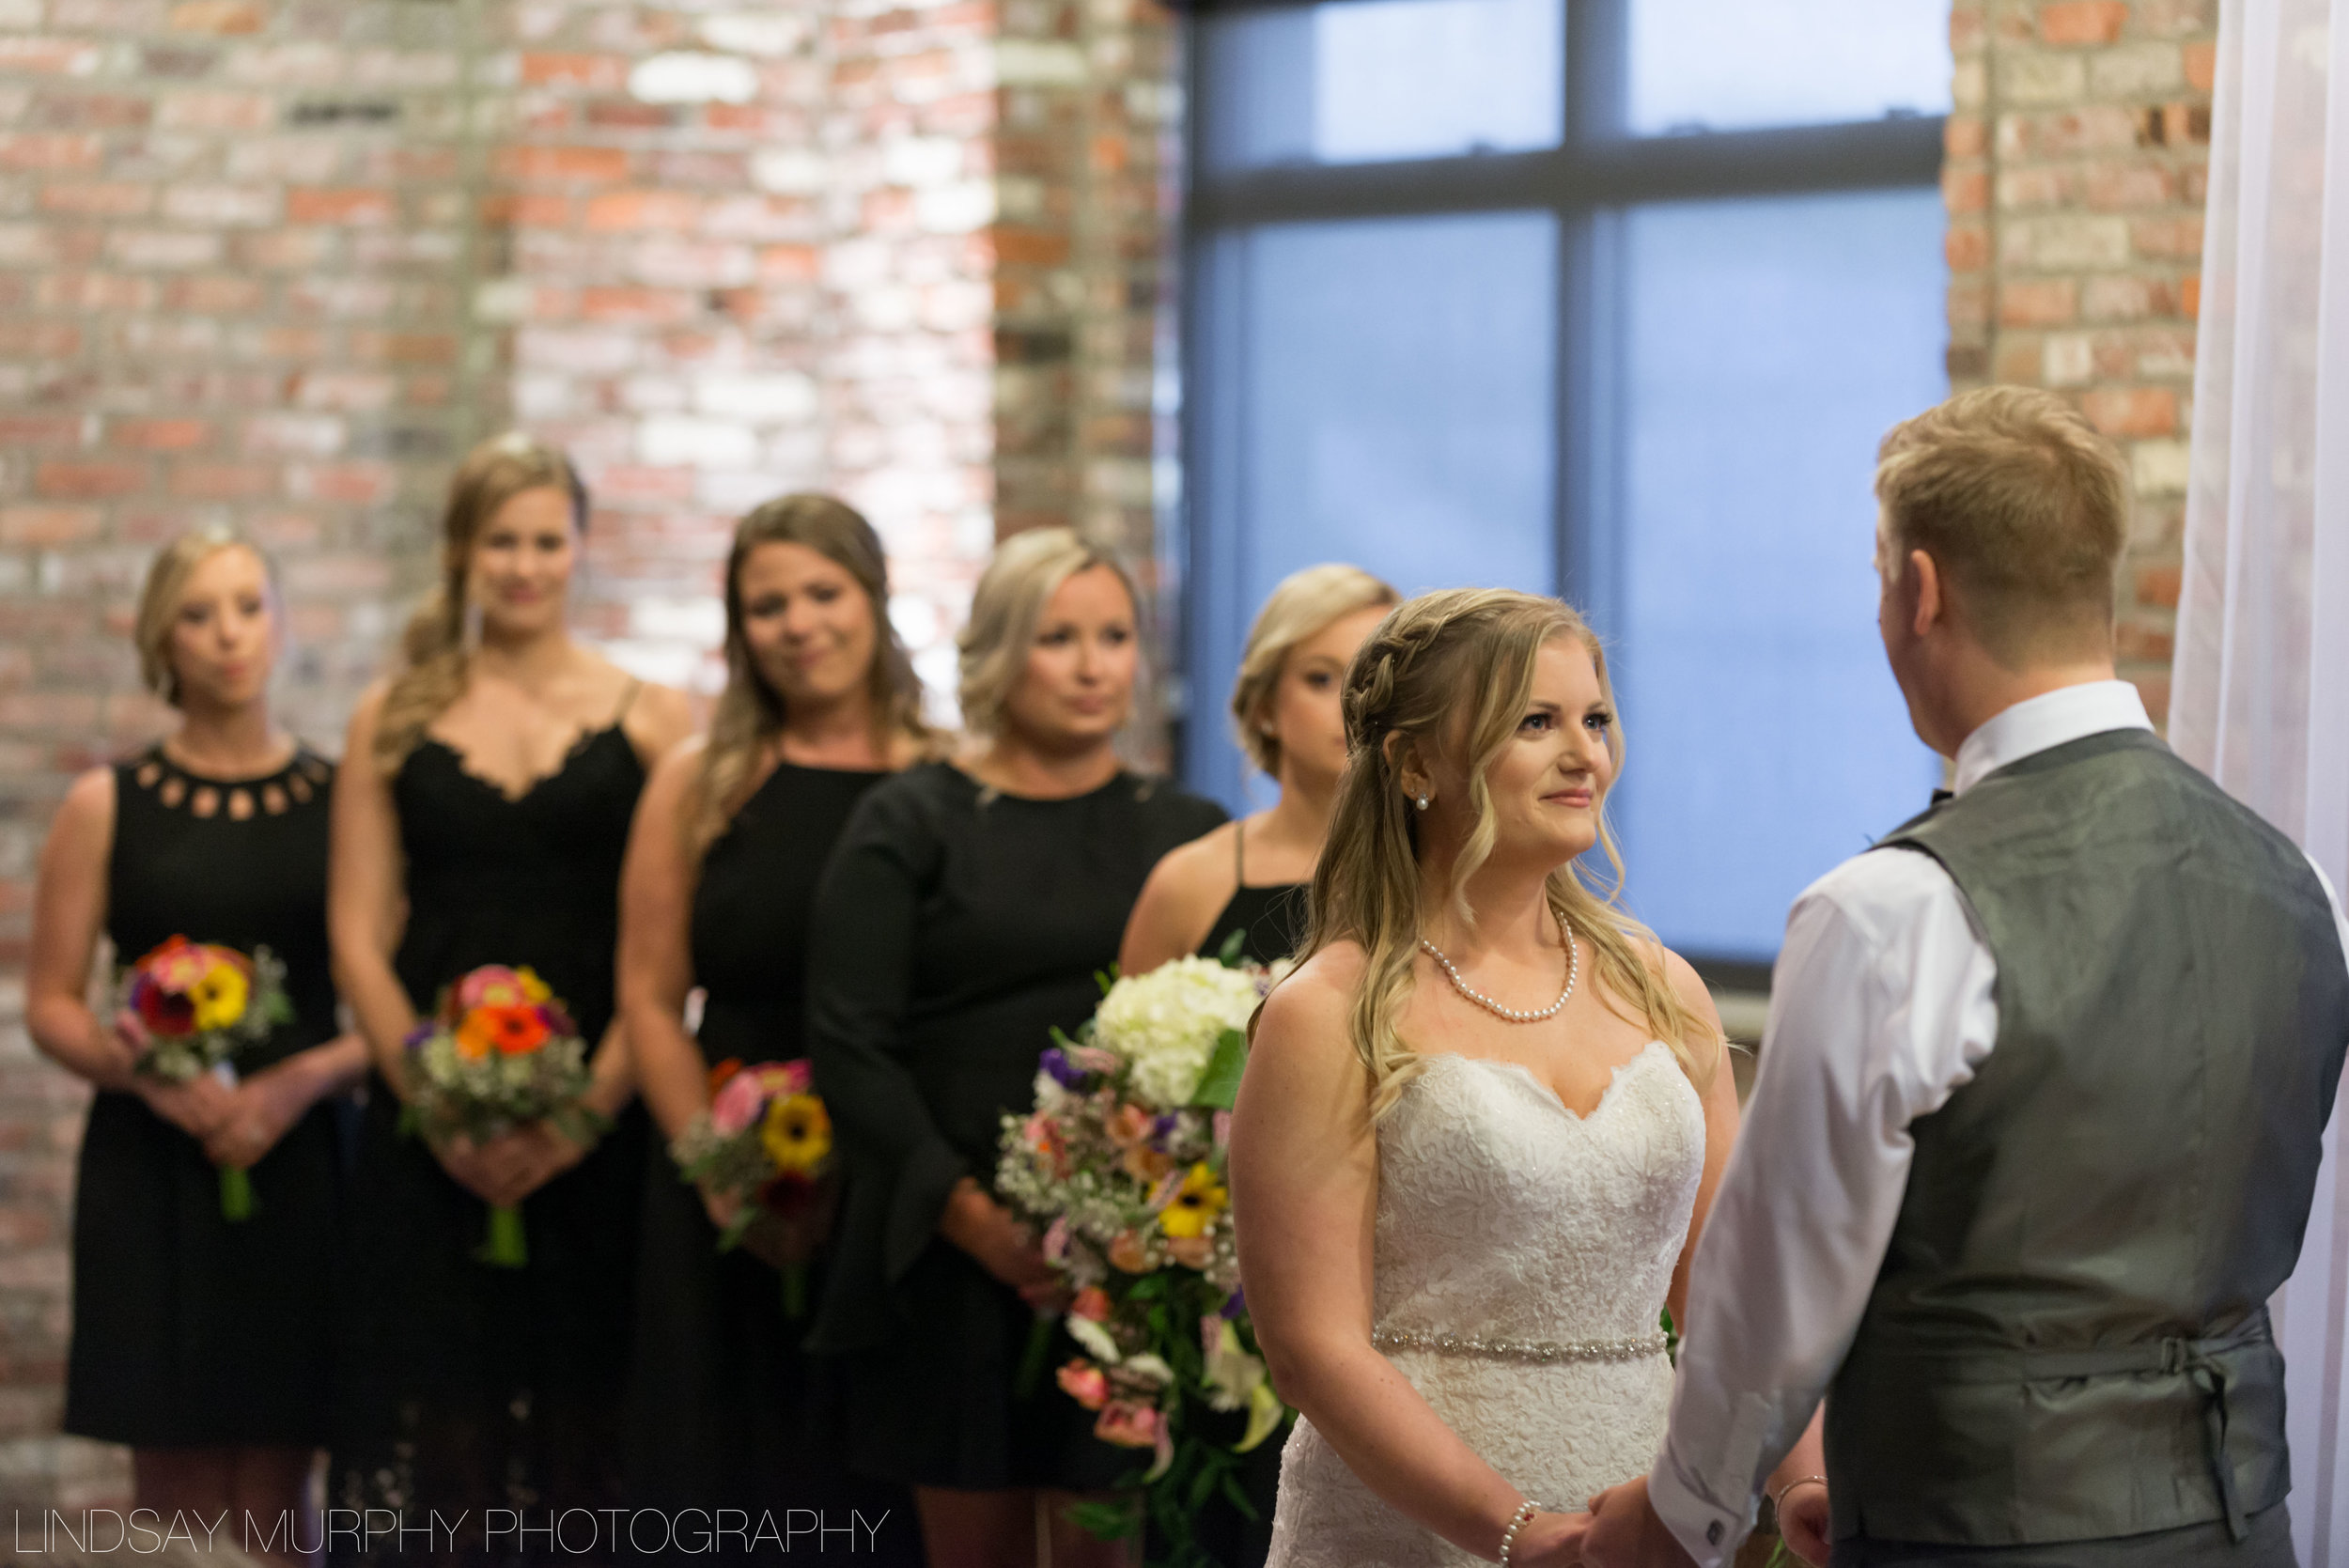 Tacoma_Wedding_photography-9.jpg